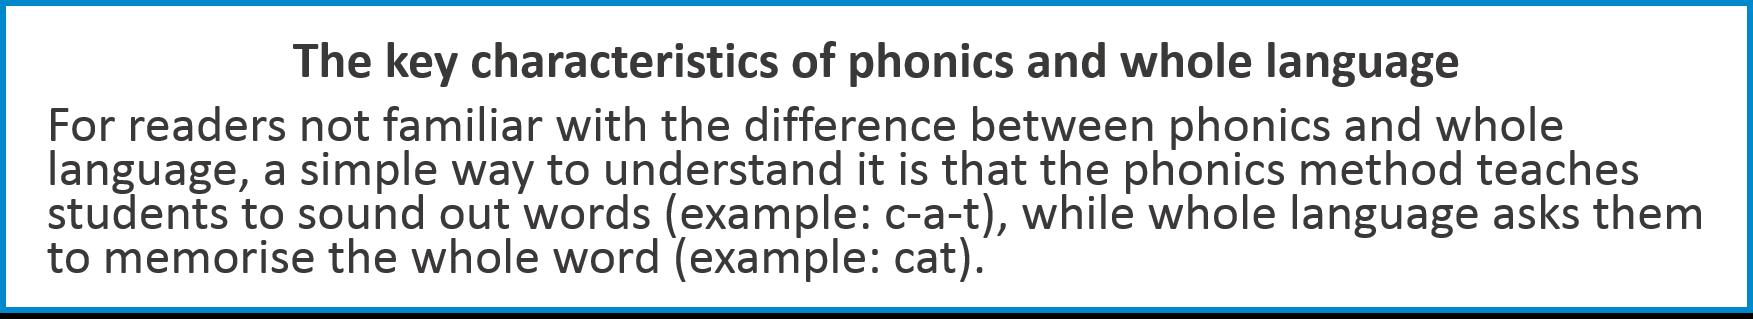 Phonics_image